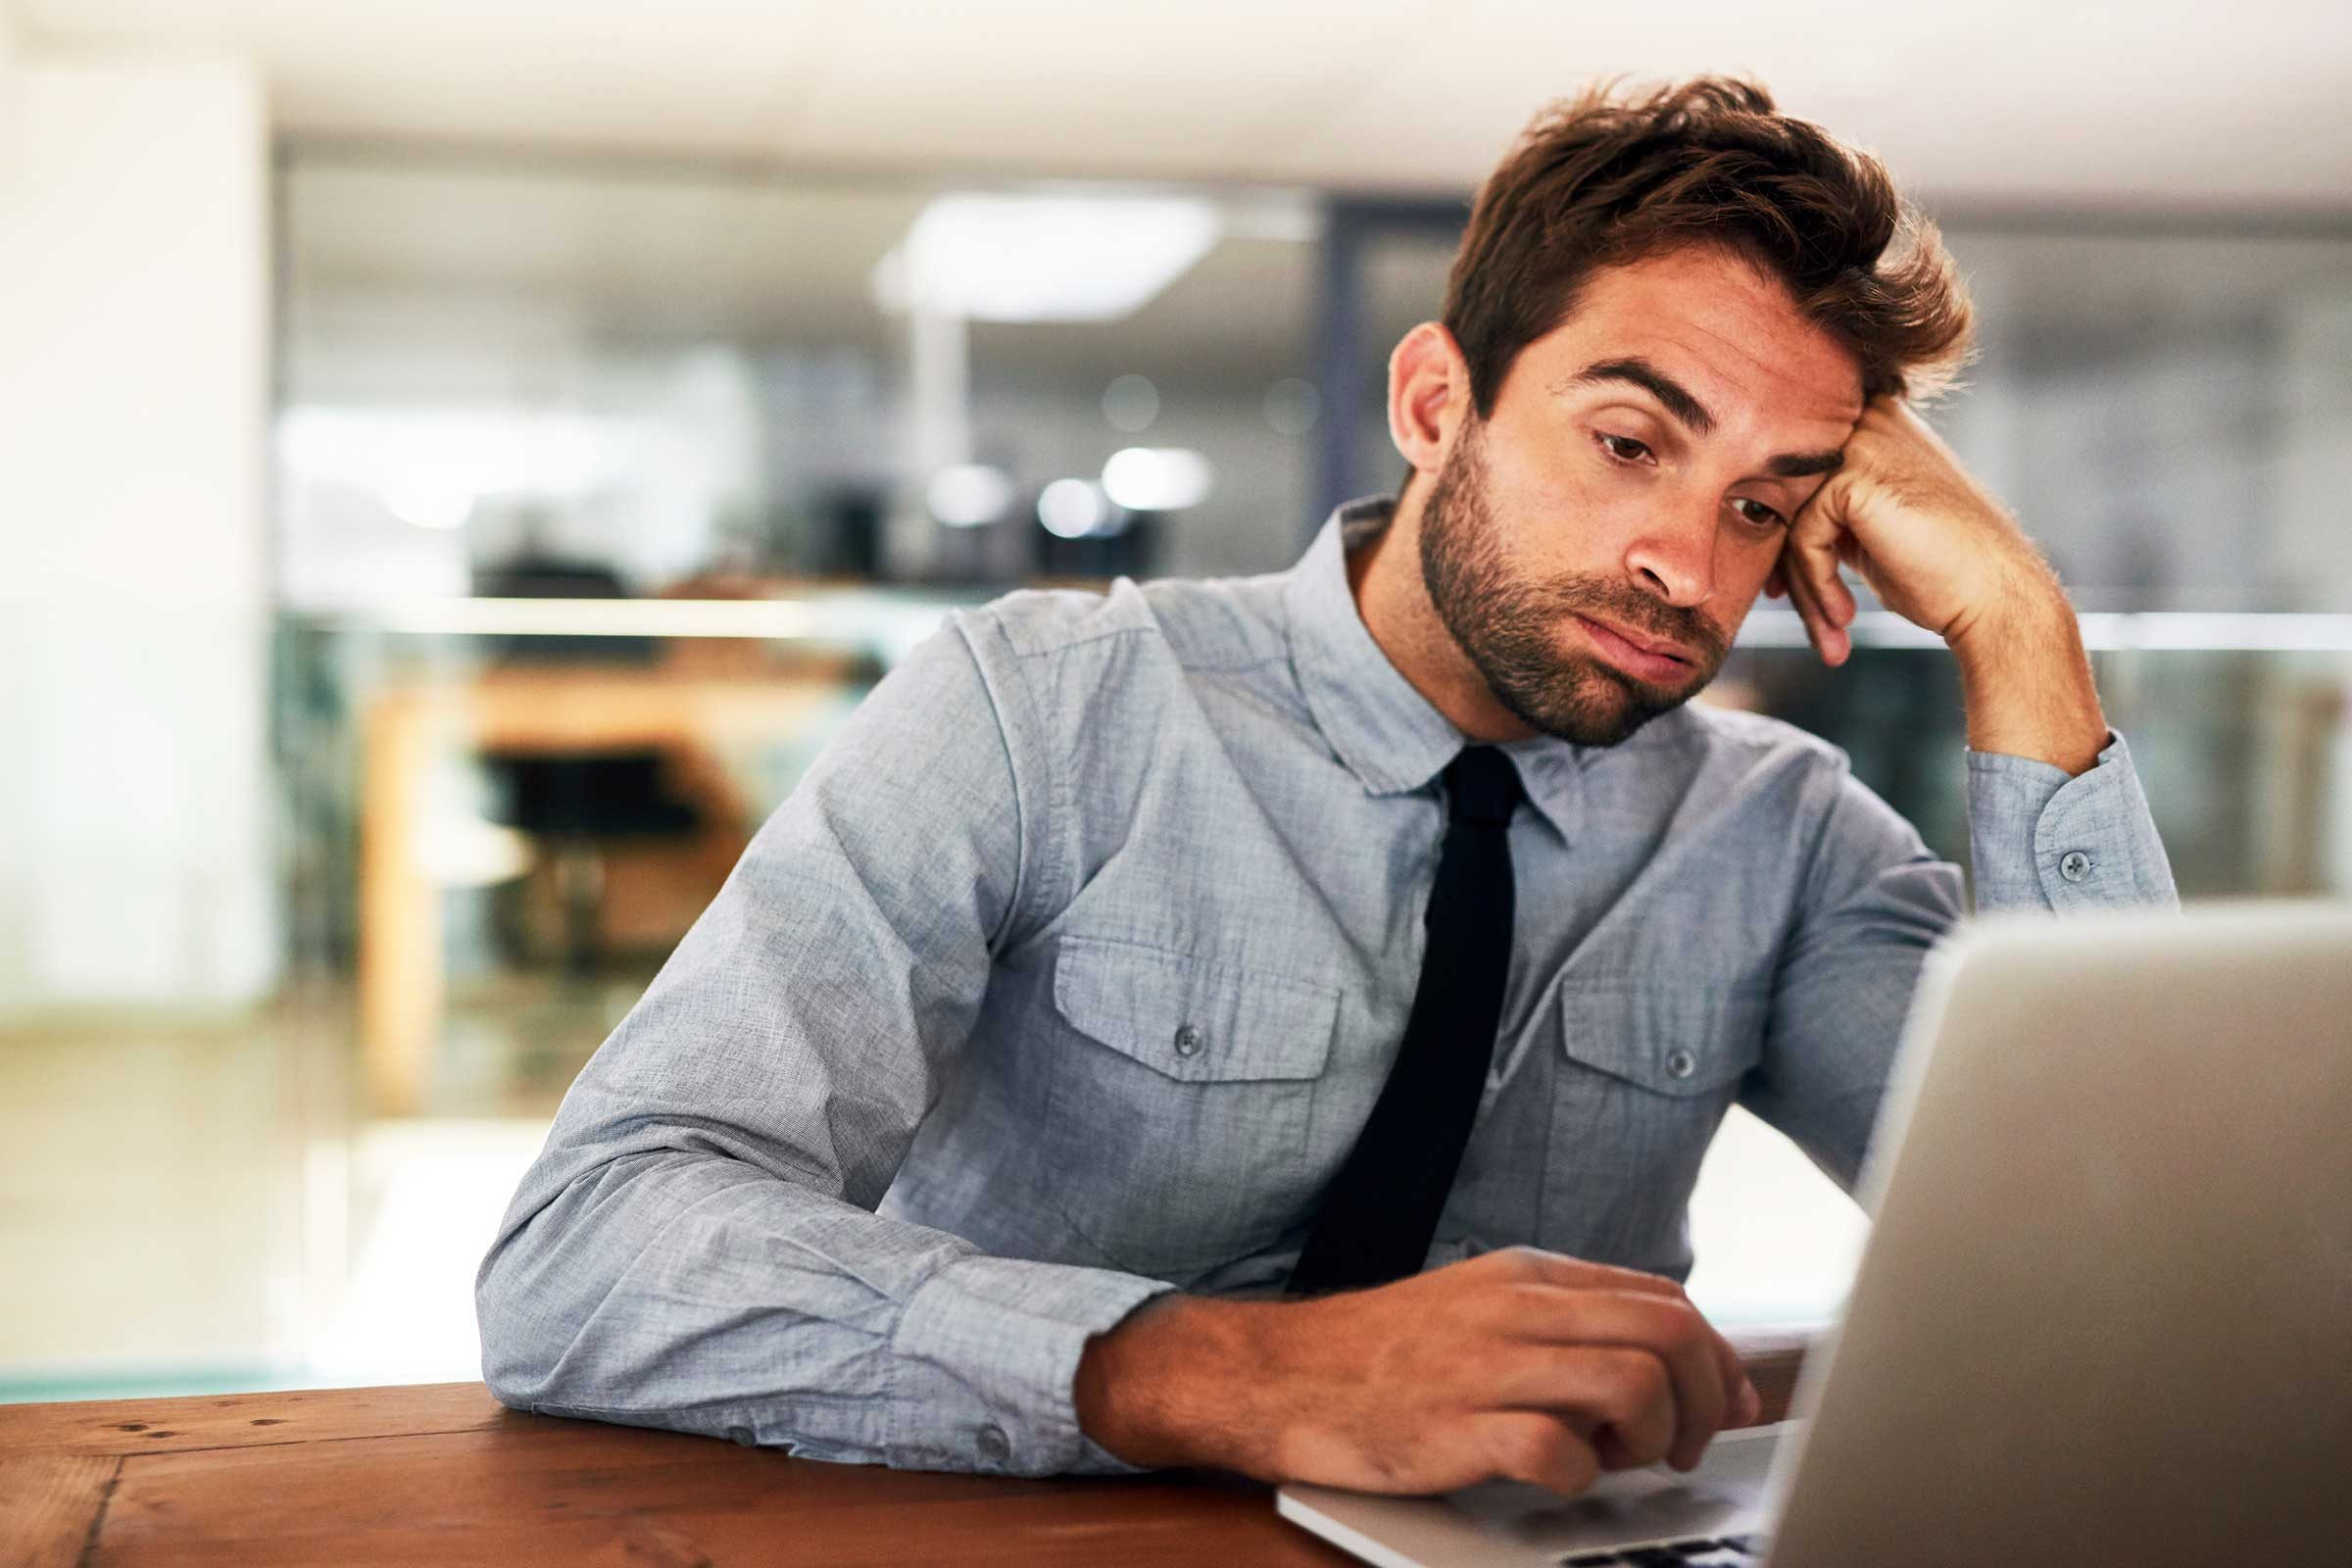 depression sad wish psychologists knew peopleimages health